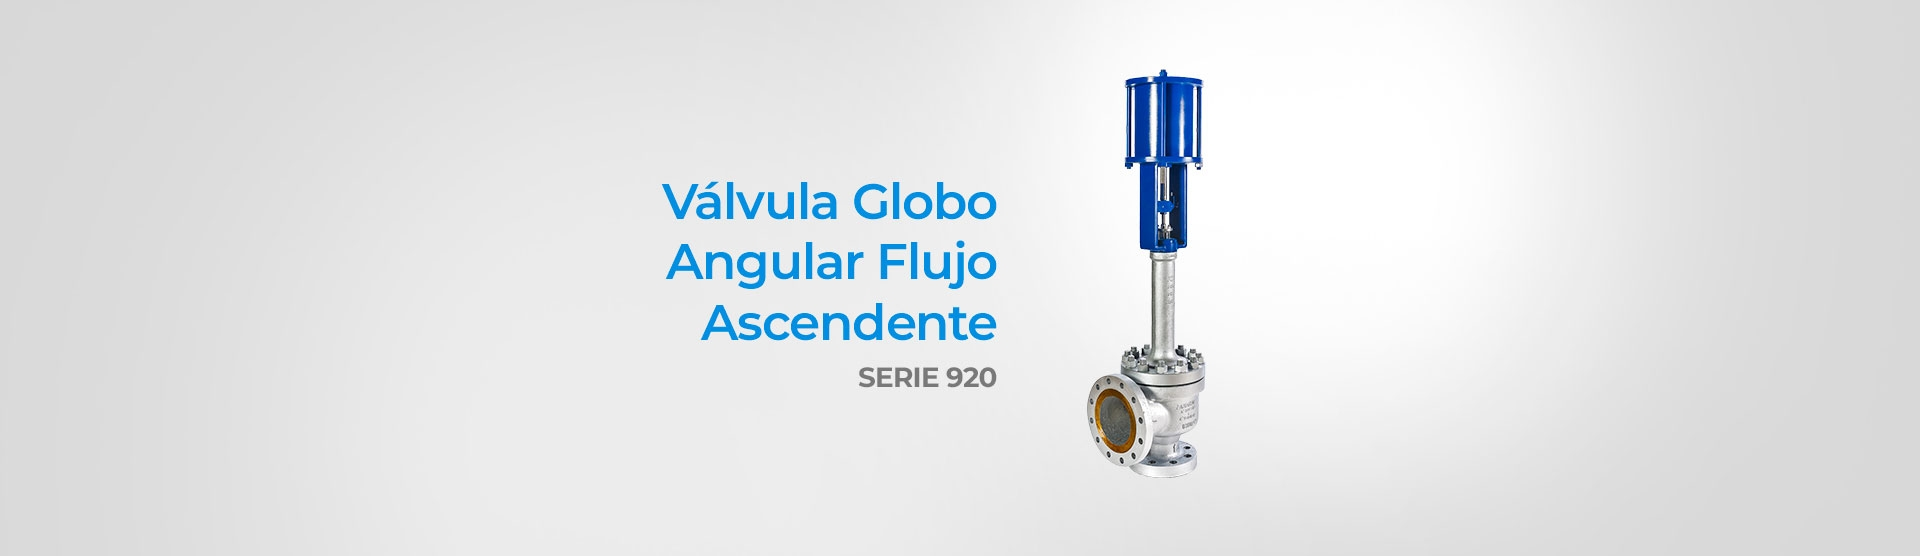 Válvula Globo Angular Flujo Ascendente (Serie 920)